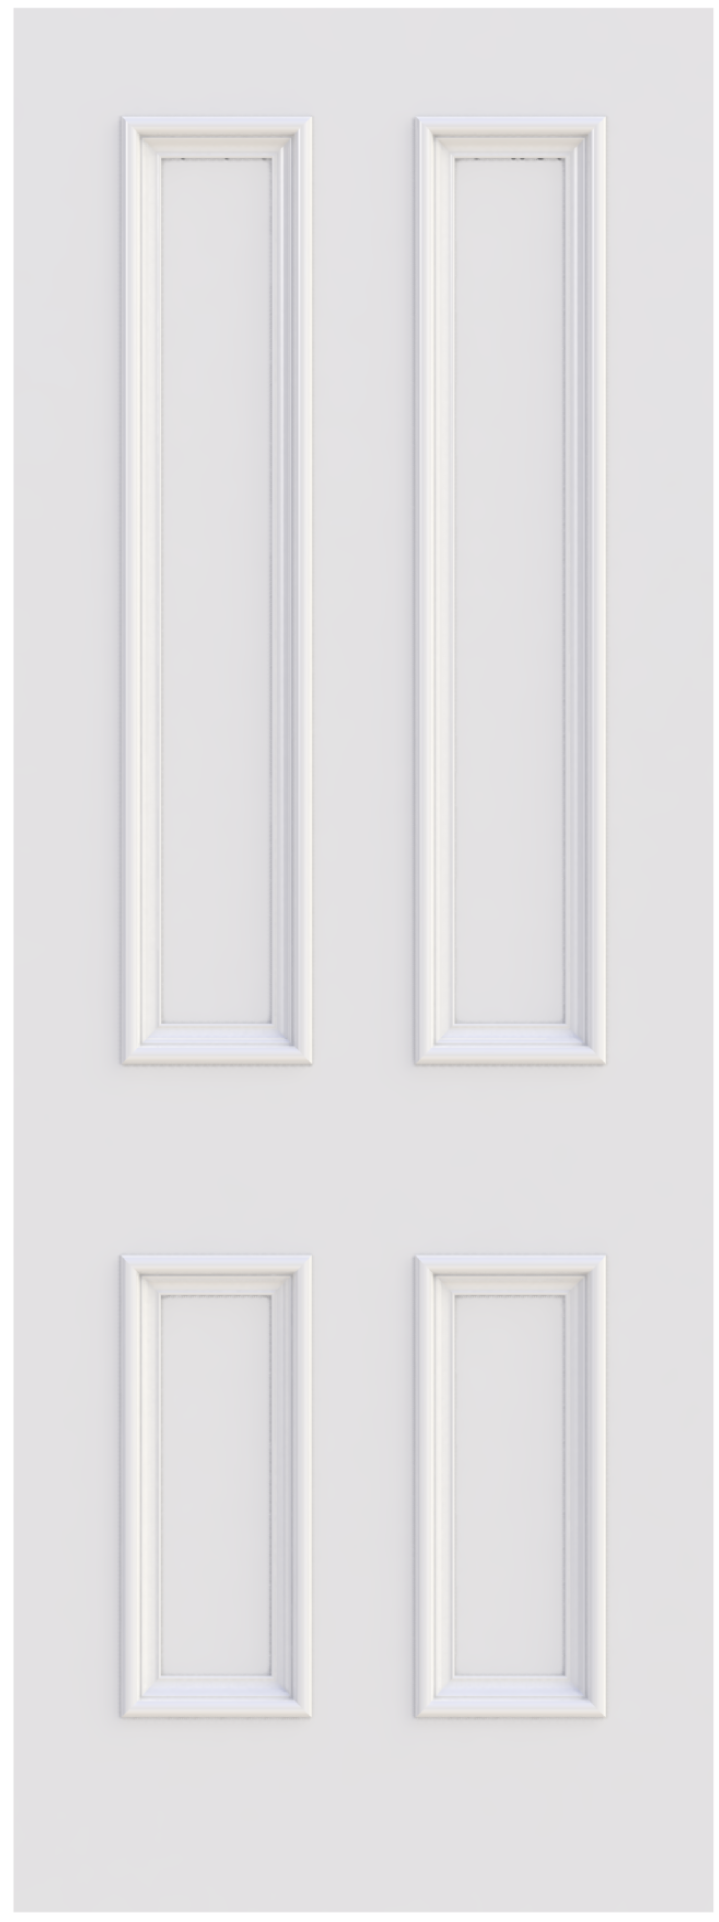 4 panel white interior doors. 4 Panel Doors White Interior R